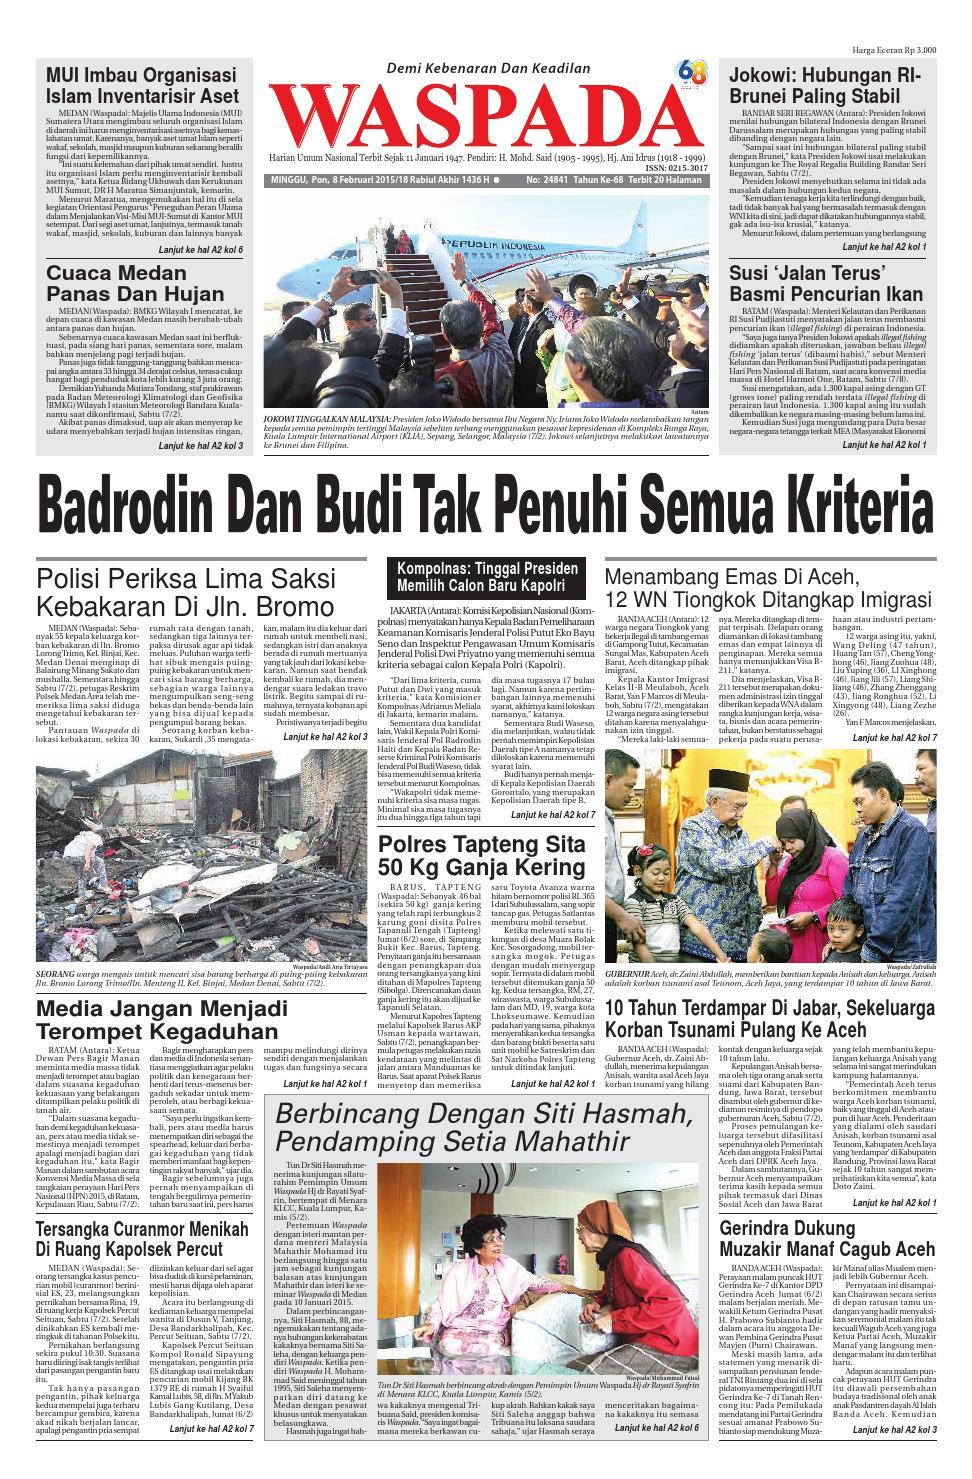 Waspada Minggu 8 Februari 2015 By Harian Issuu Jam Tangan Fashion Couple Pinewood  Sepasang